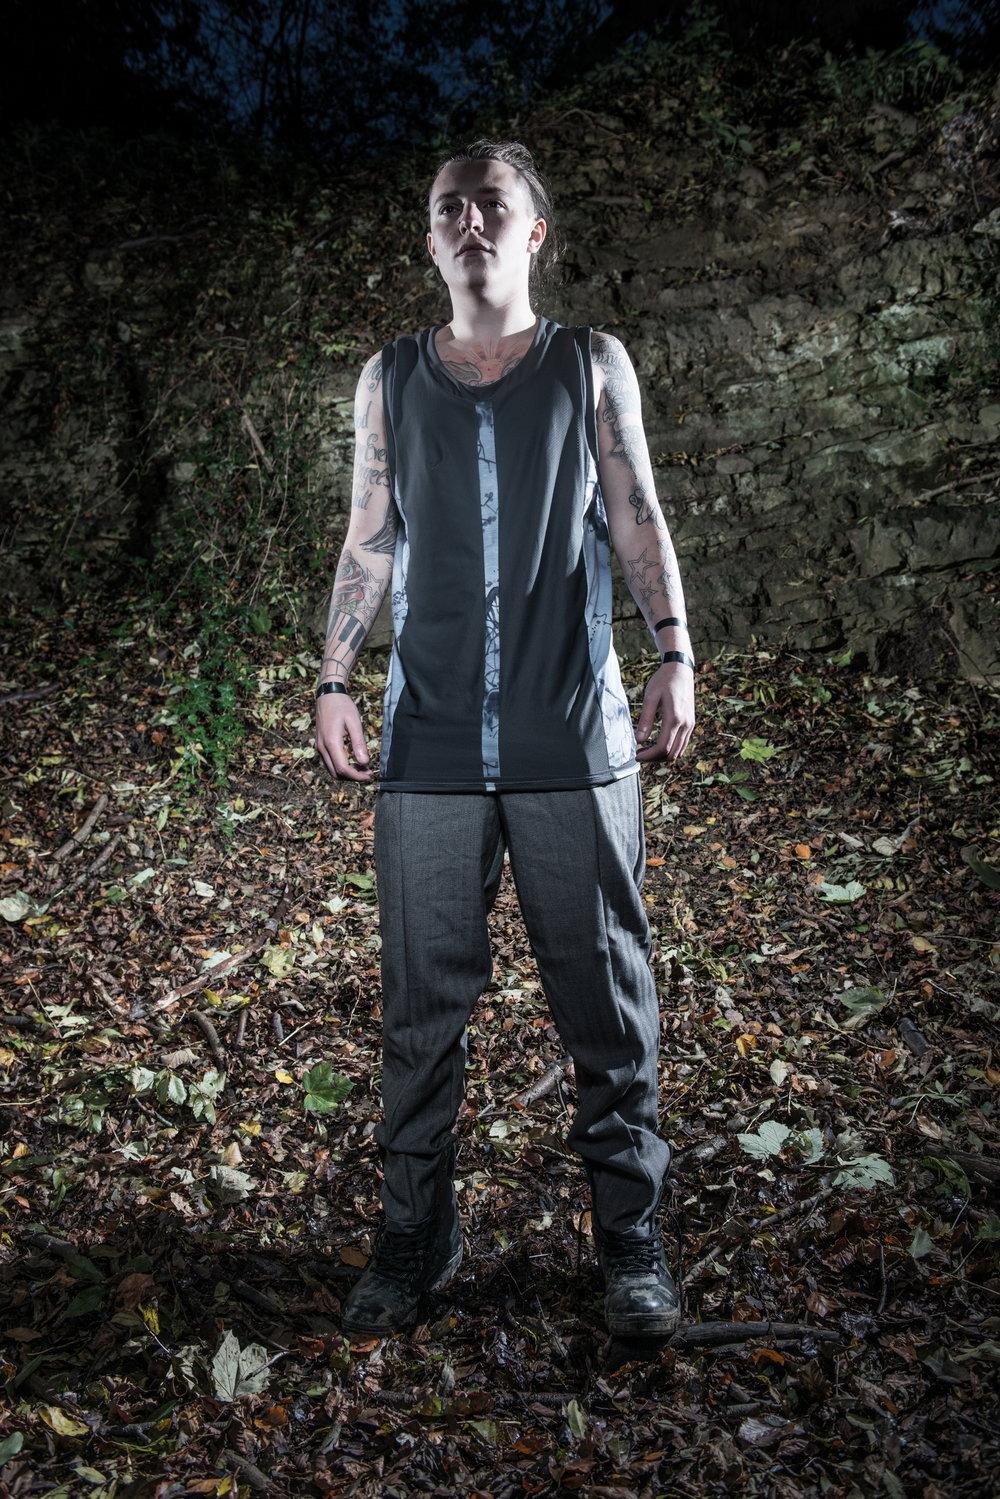 zaramia-ava-zaramiaava-leeds-fashion-designer-ethical-sustainable-tailored-minimalist-versatile-drape-grey-shirt-vest-top-denim-trousers-black-grey-texture-styling-menswear-model-photoshoot-location-5